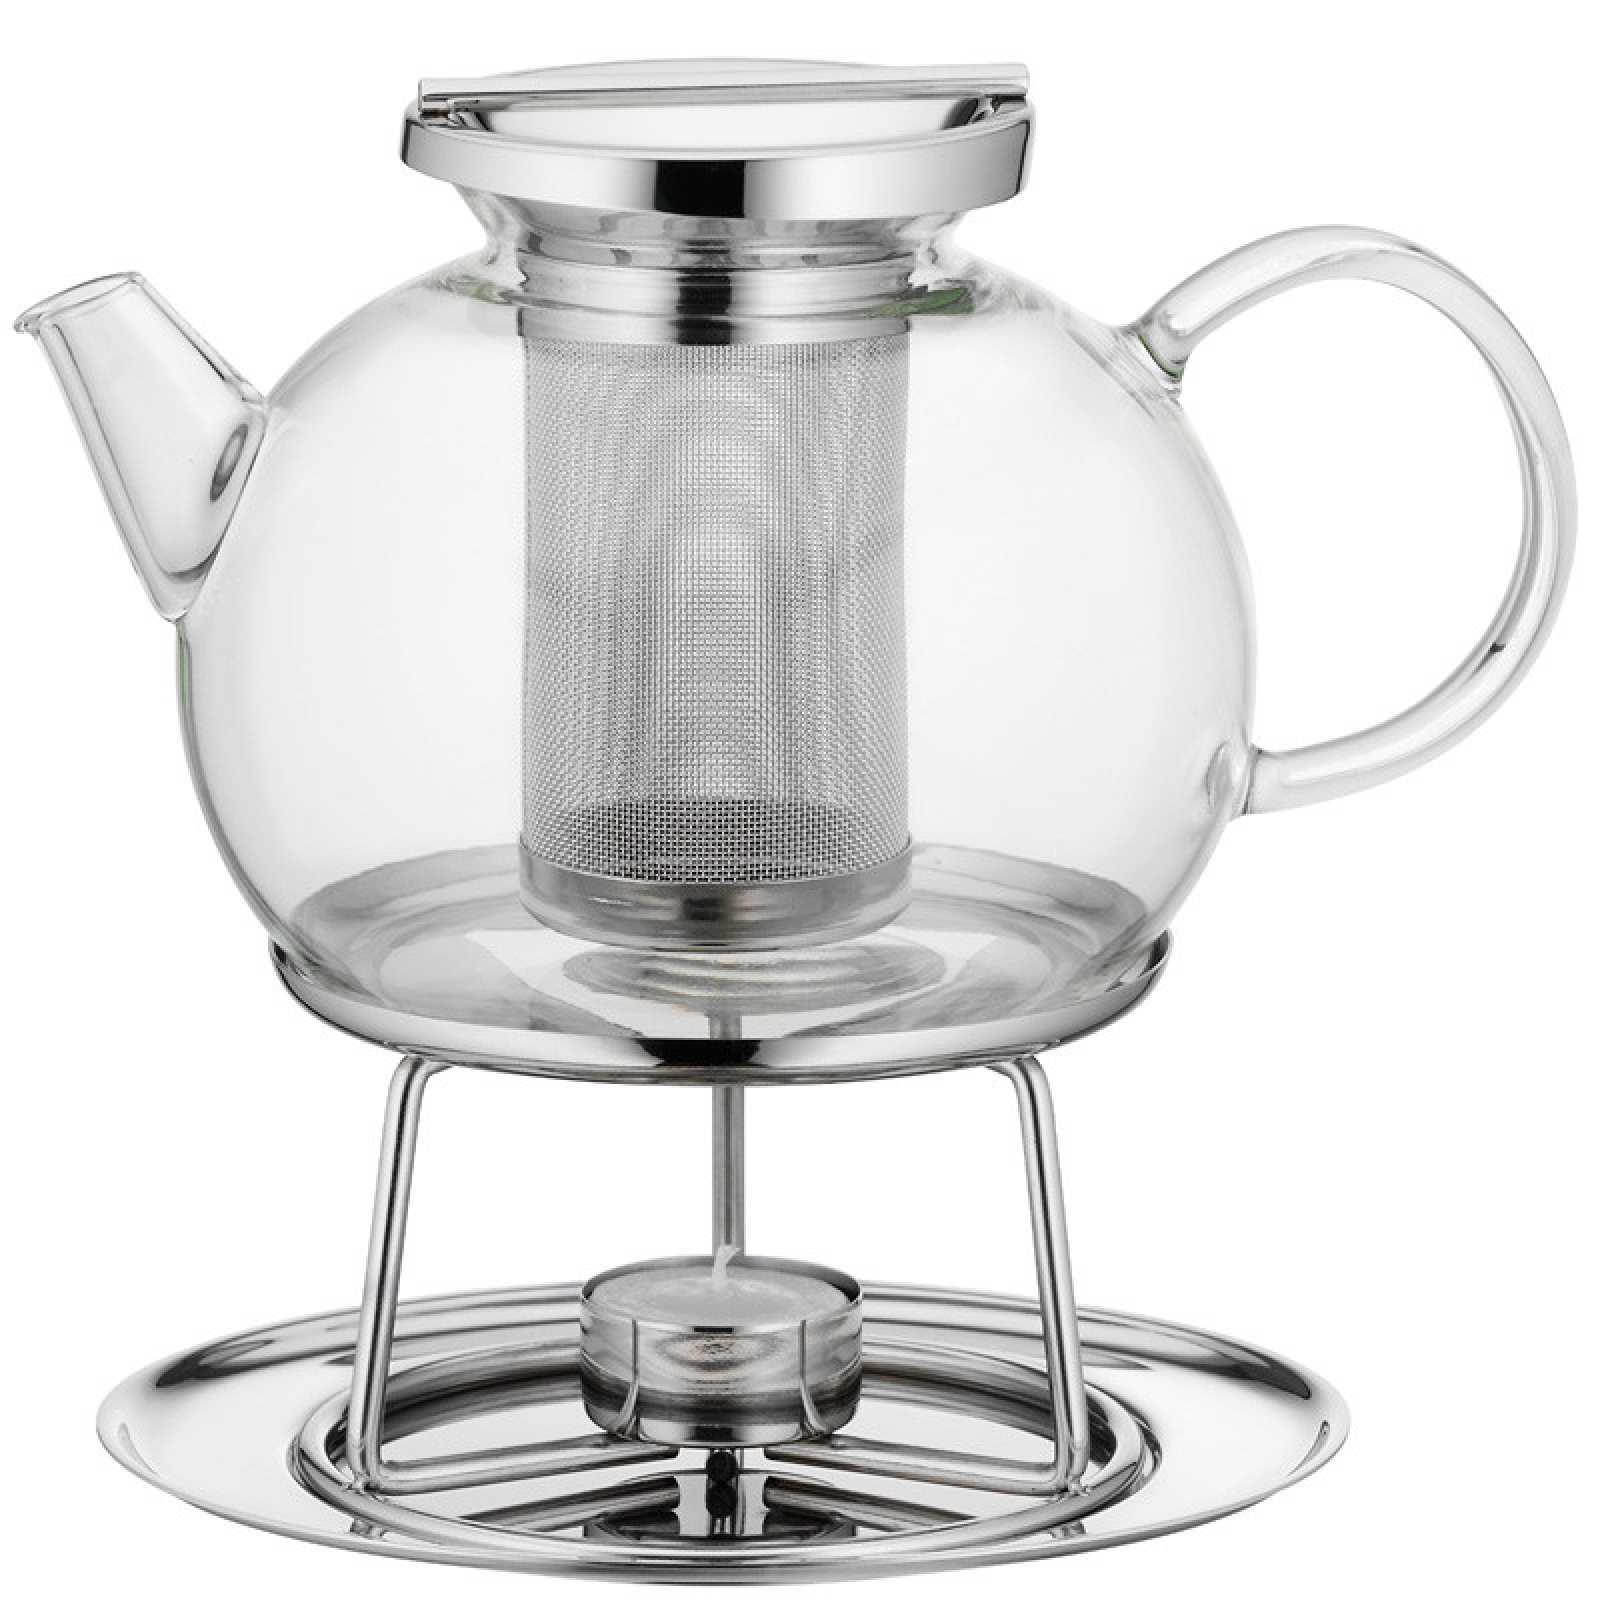 Онлайн каталог PROMENU: Чайник заварочный с подогревом WMF, объем 0,75 л, прозрачный WMF 06 3080 6040